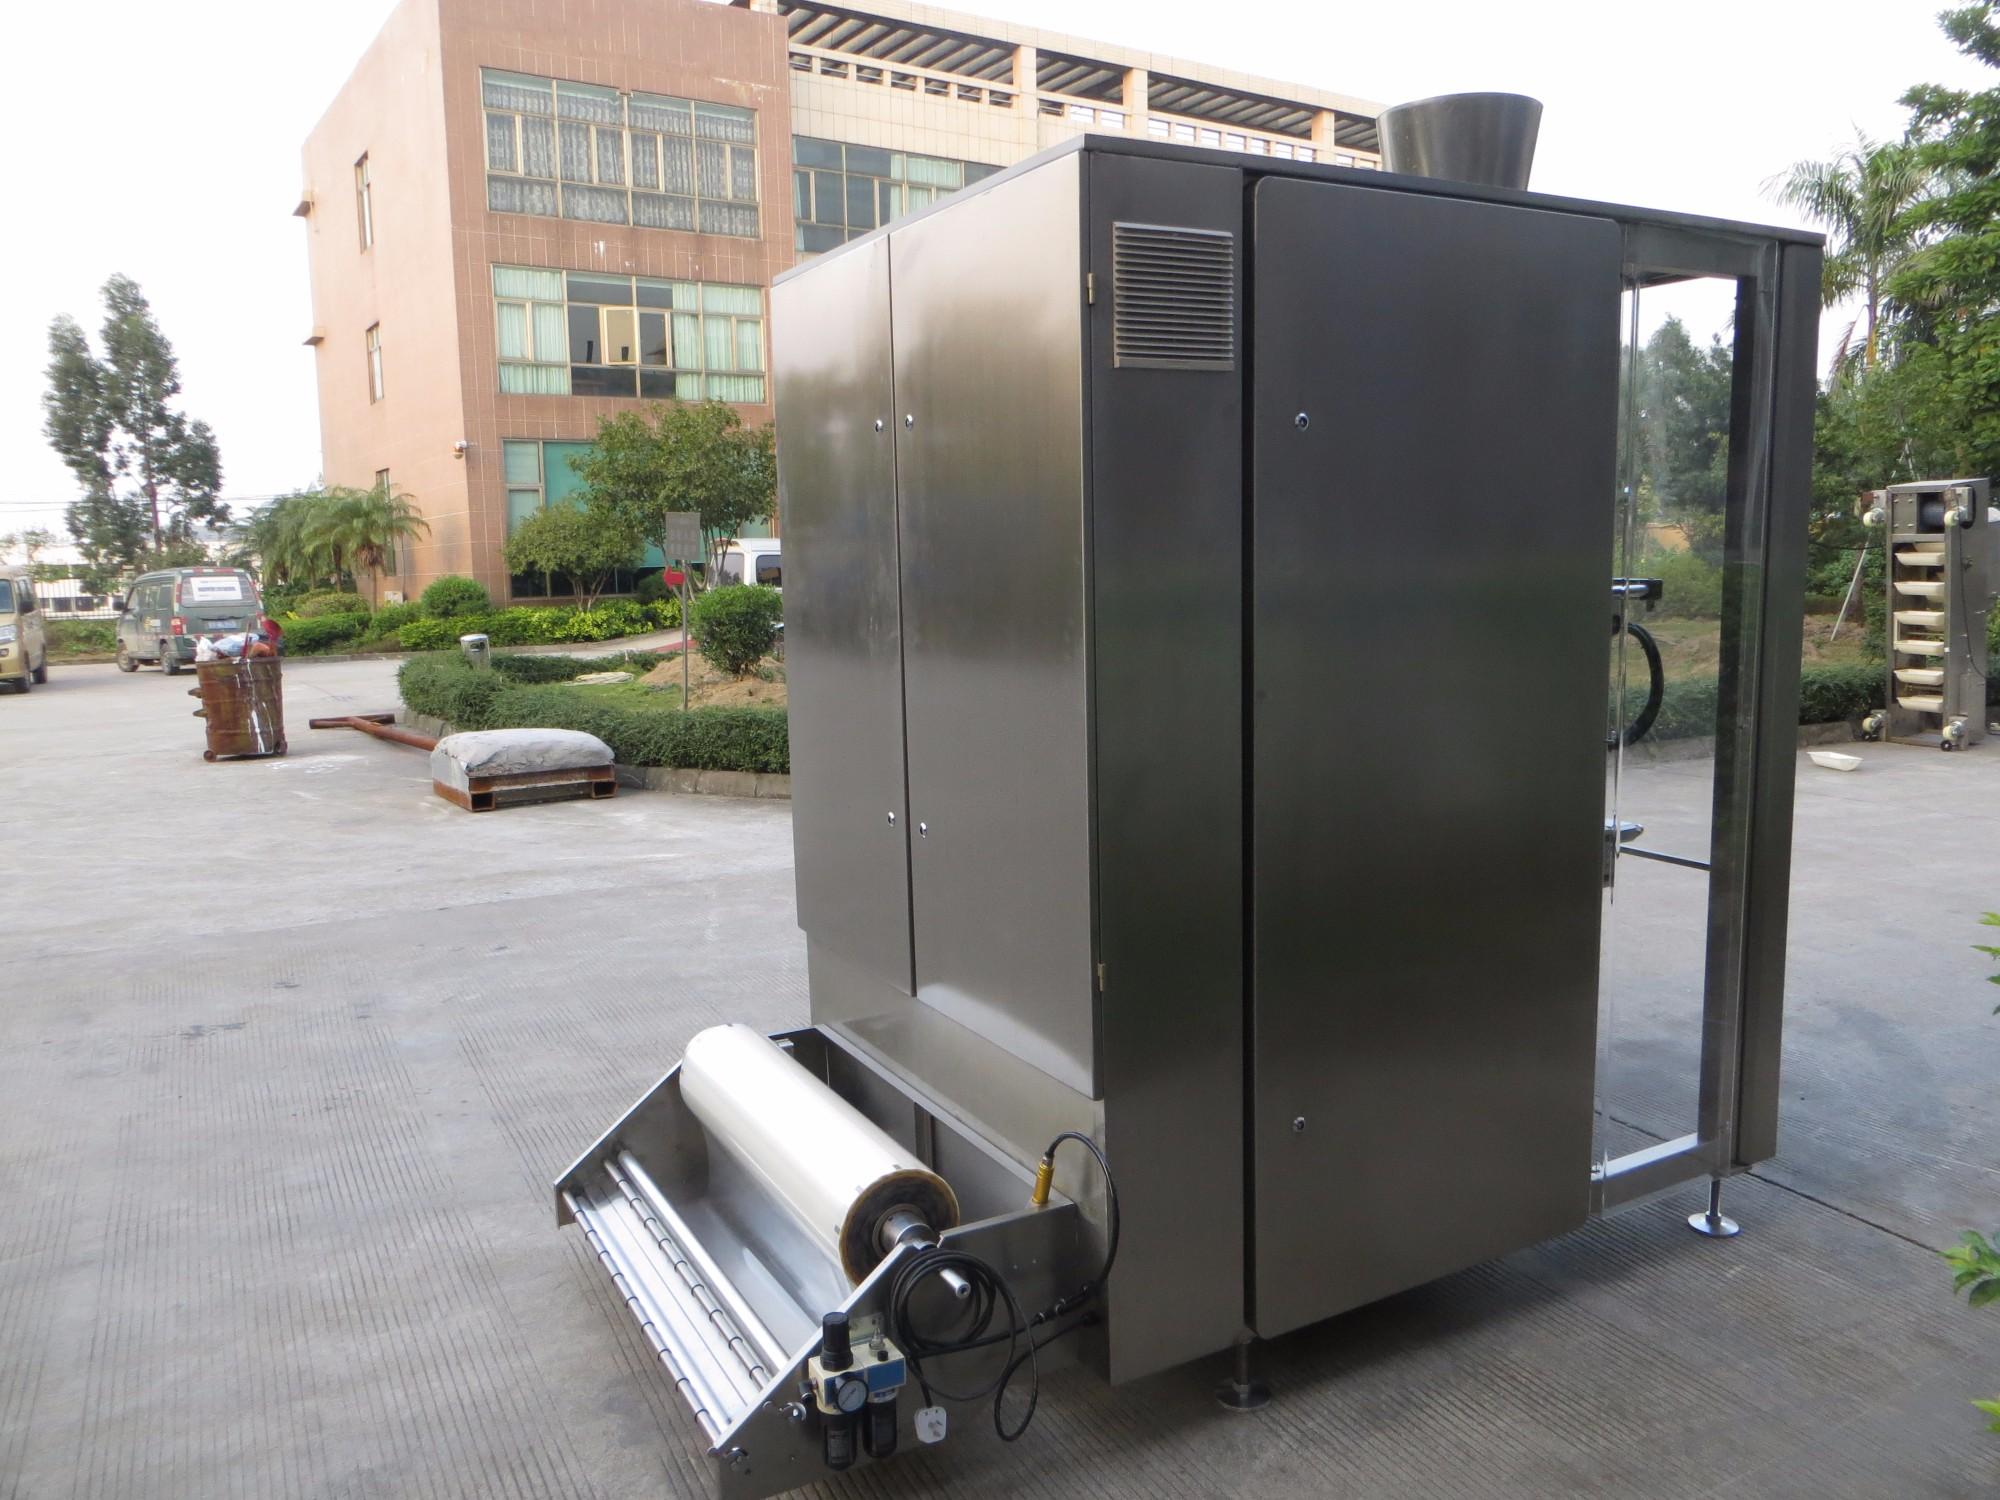 5kg Fertilizer Packing Machine Manufacturers, 5kg Fertilizer Packing Machine Factory, Supply 5kg Fertilizer Packing Machine